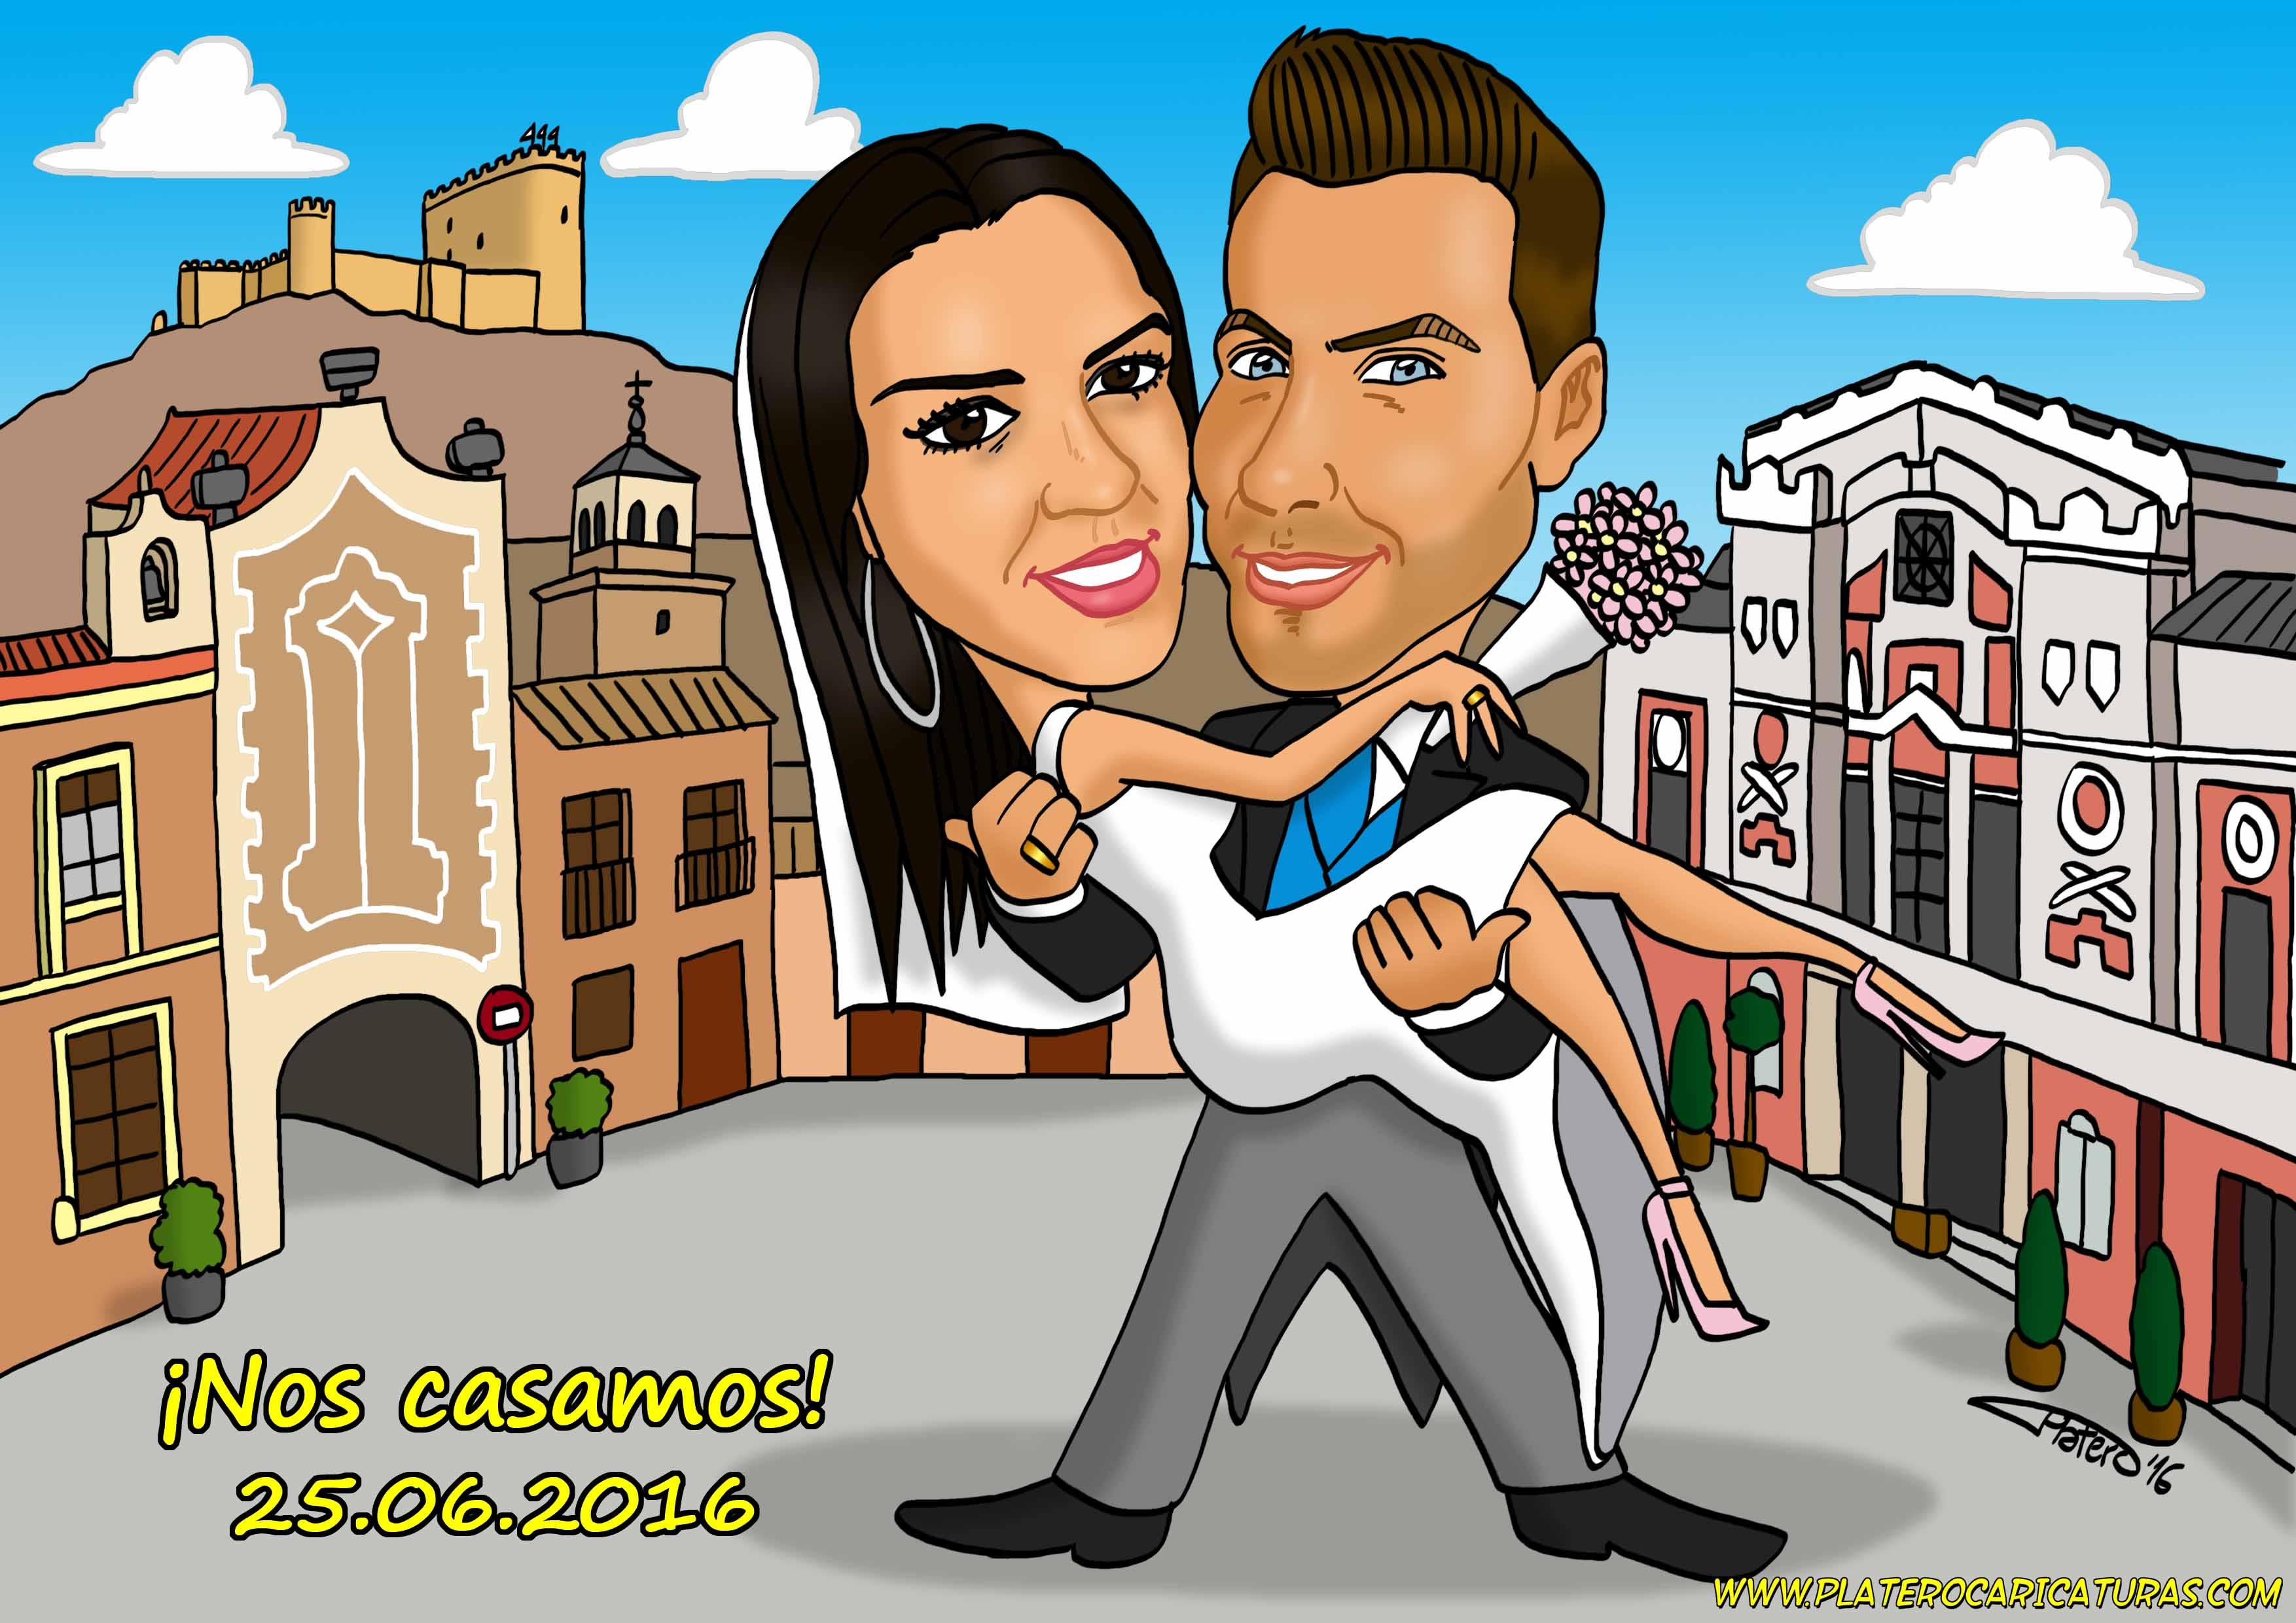 caricaturas_pareja novios con fondos_platerocaricaturas